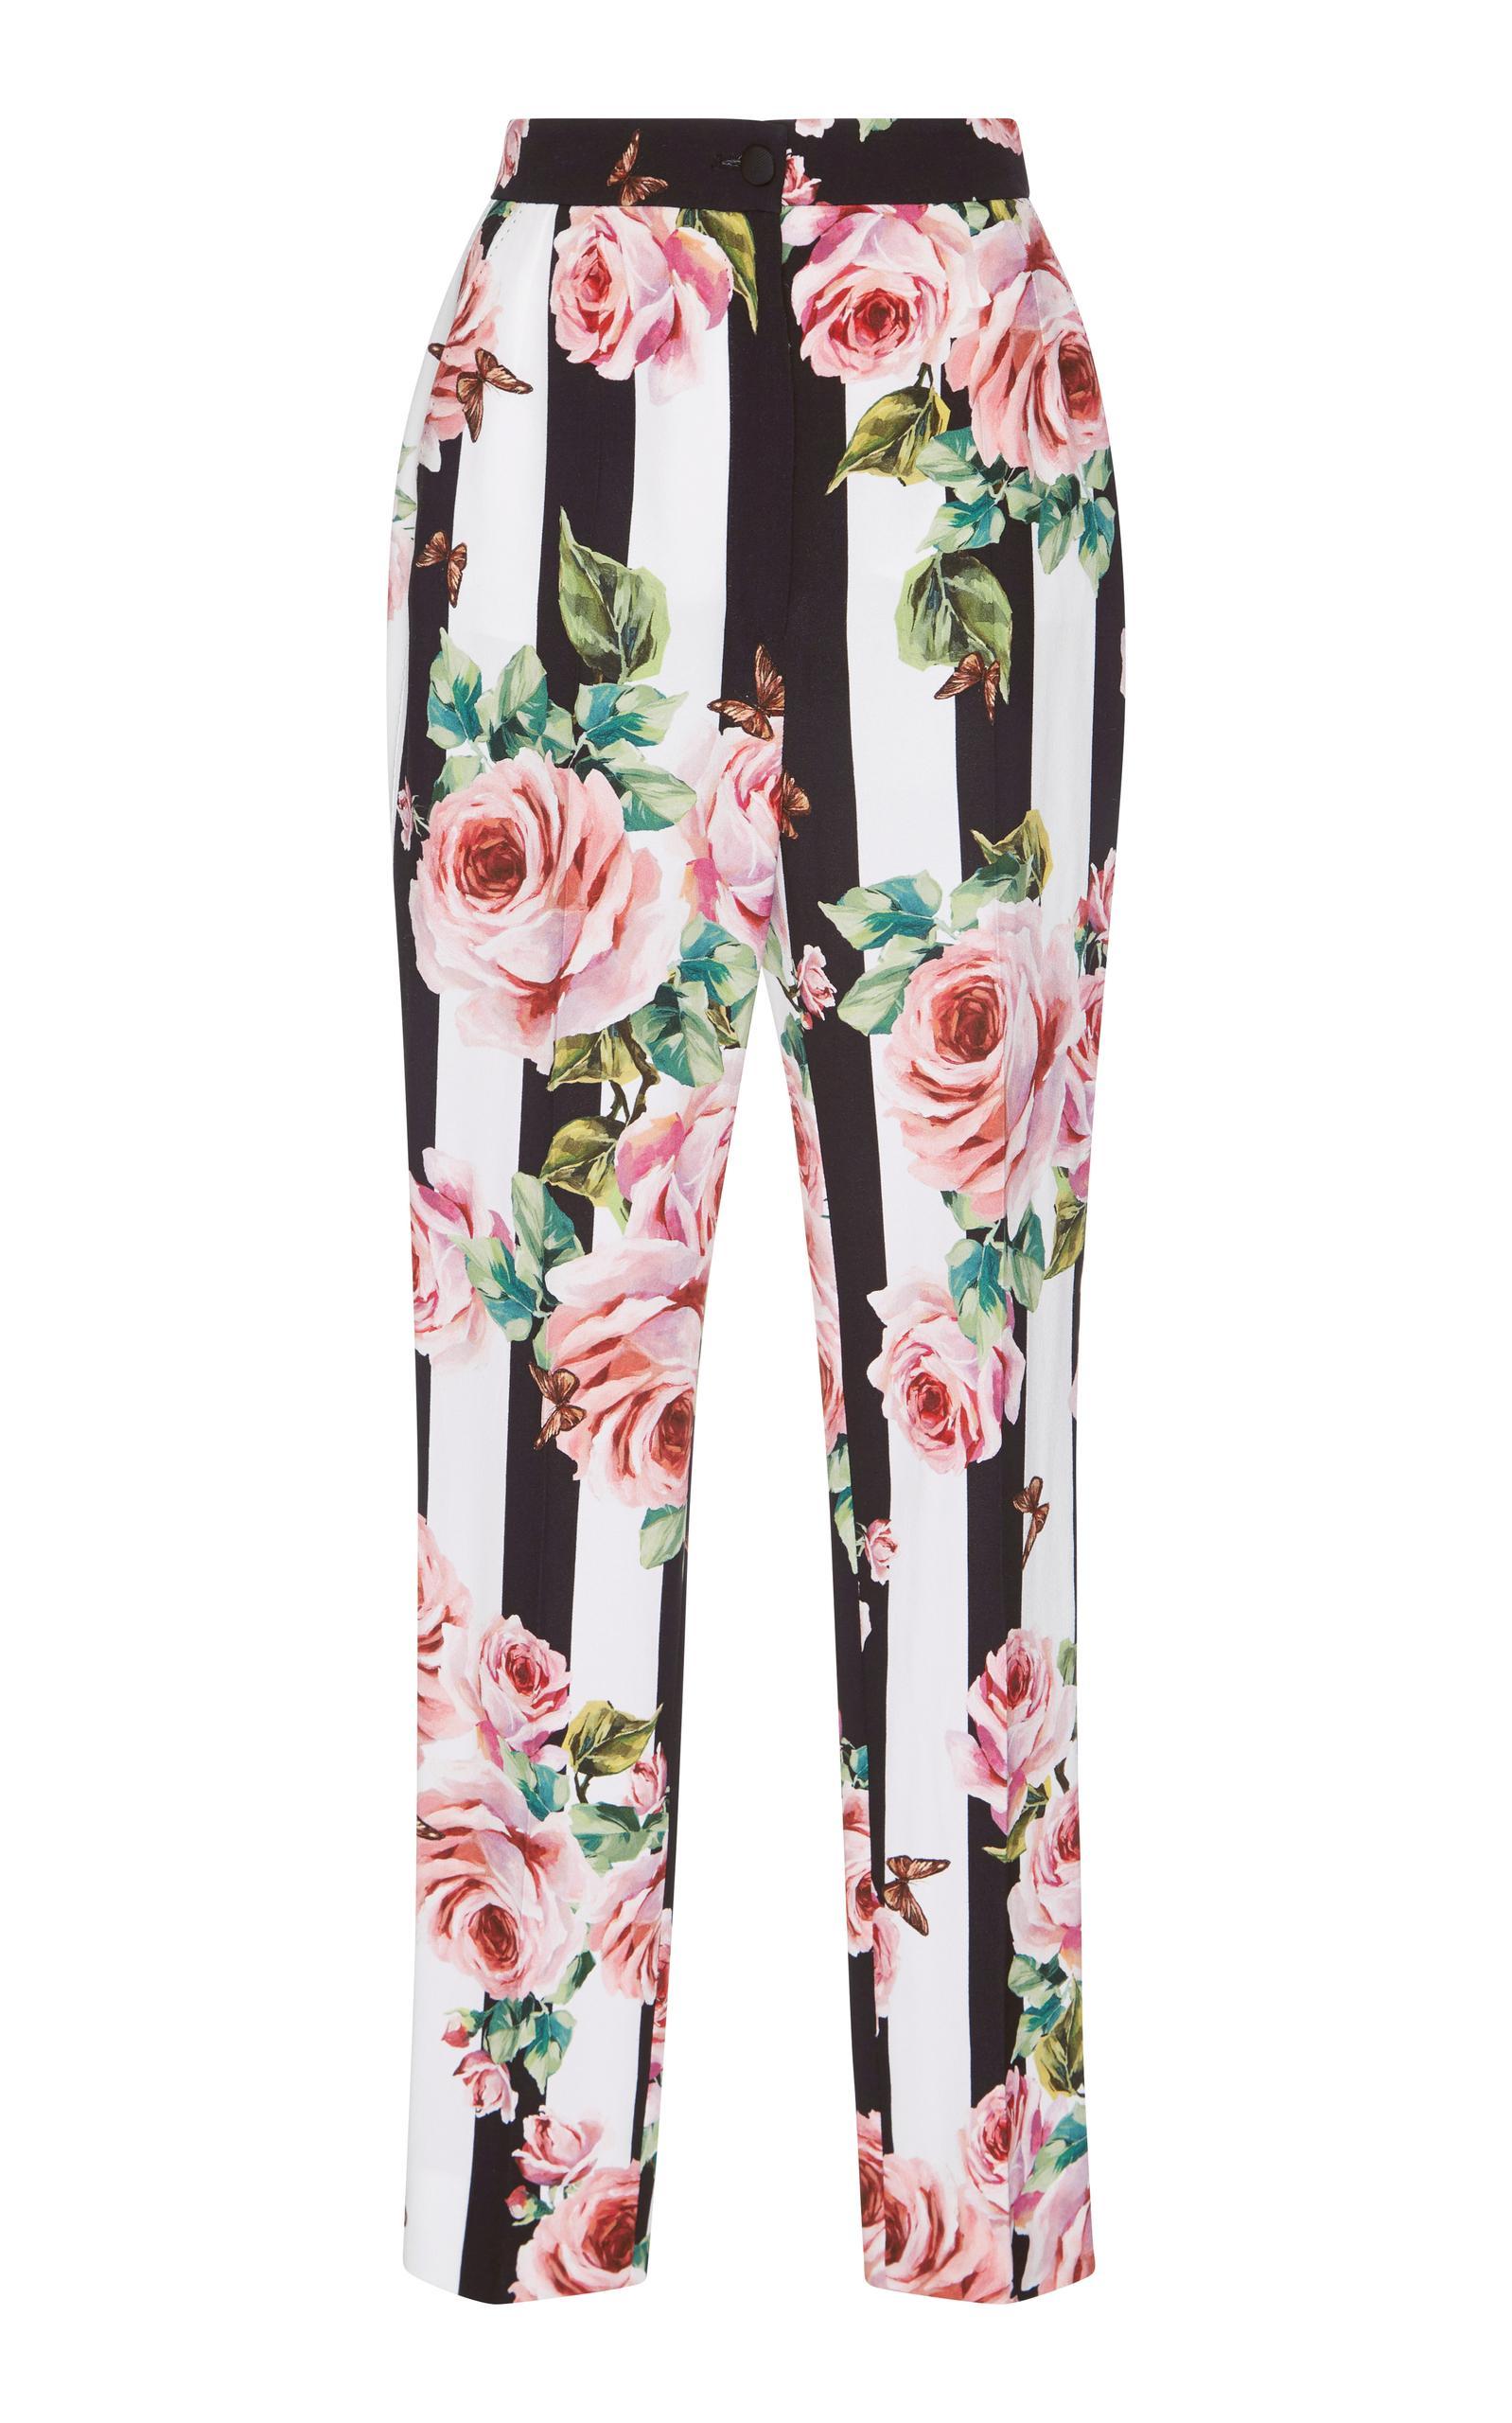 Dolce & Gabbana Floral-printed Silk Trousers In Eero